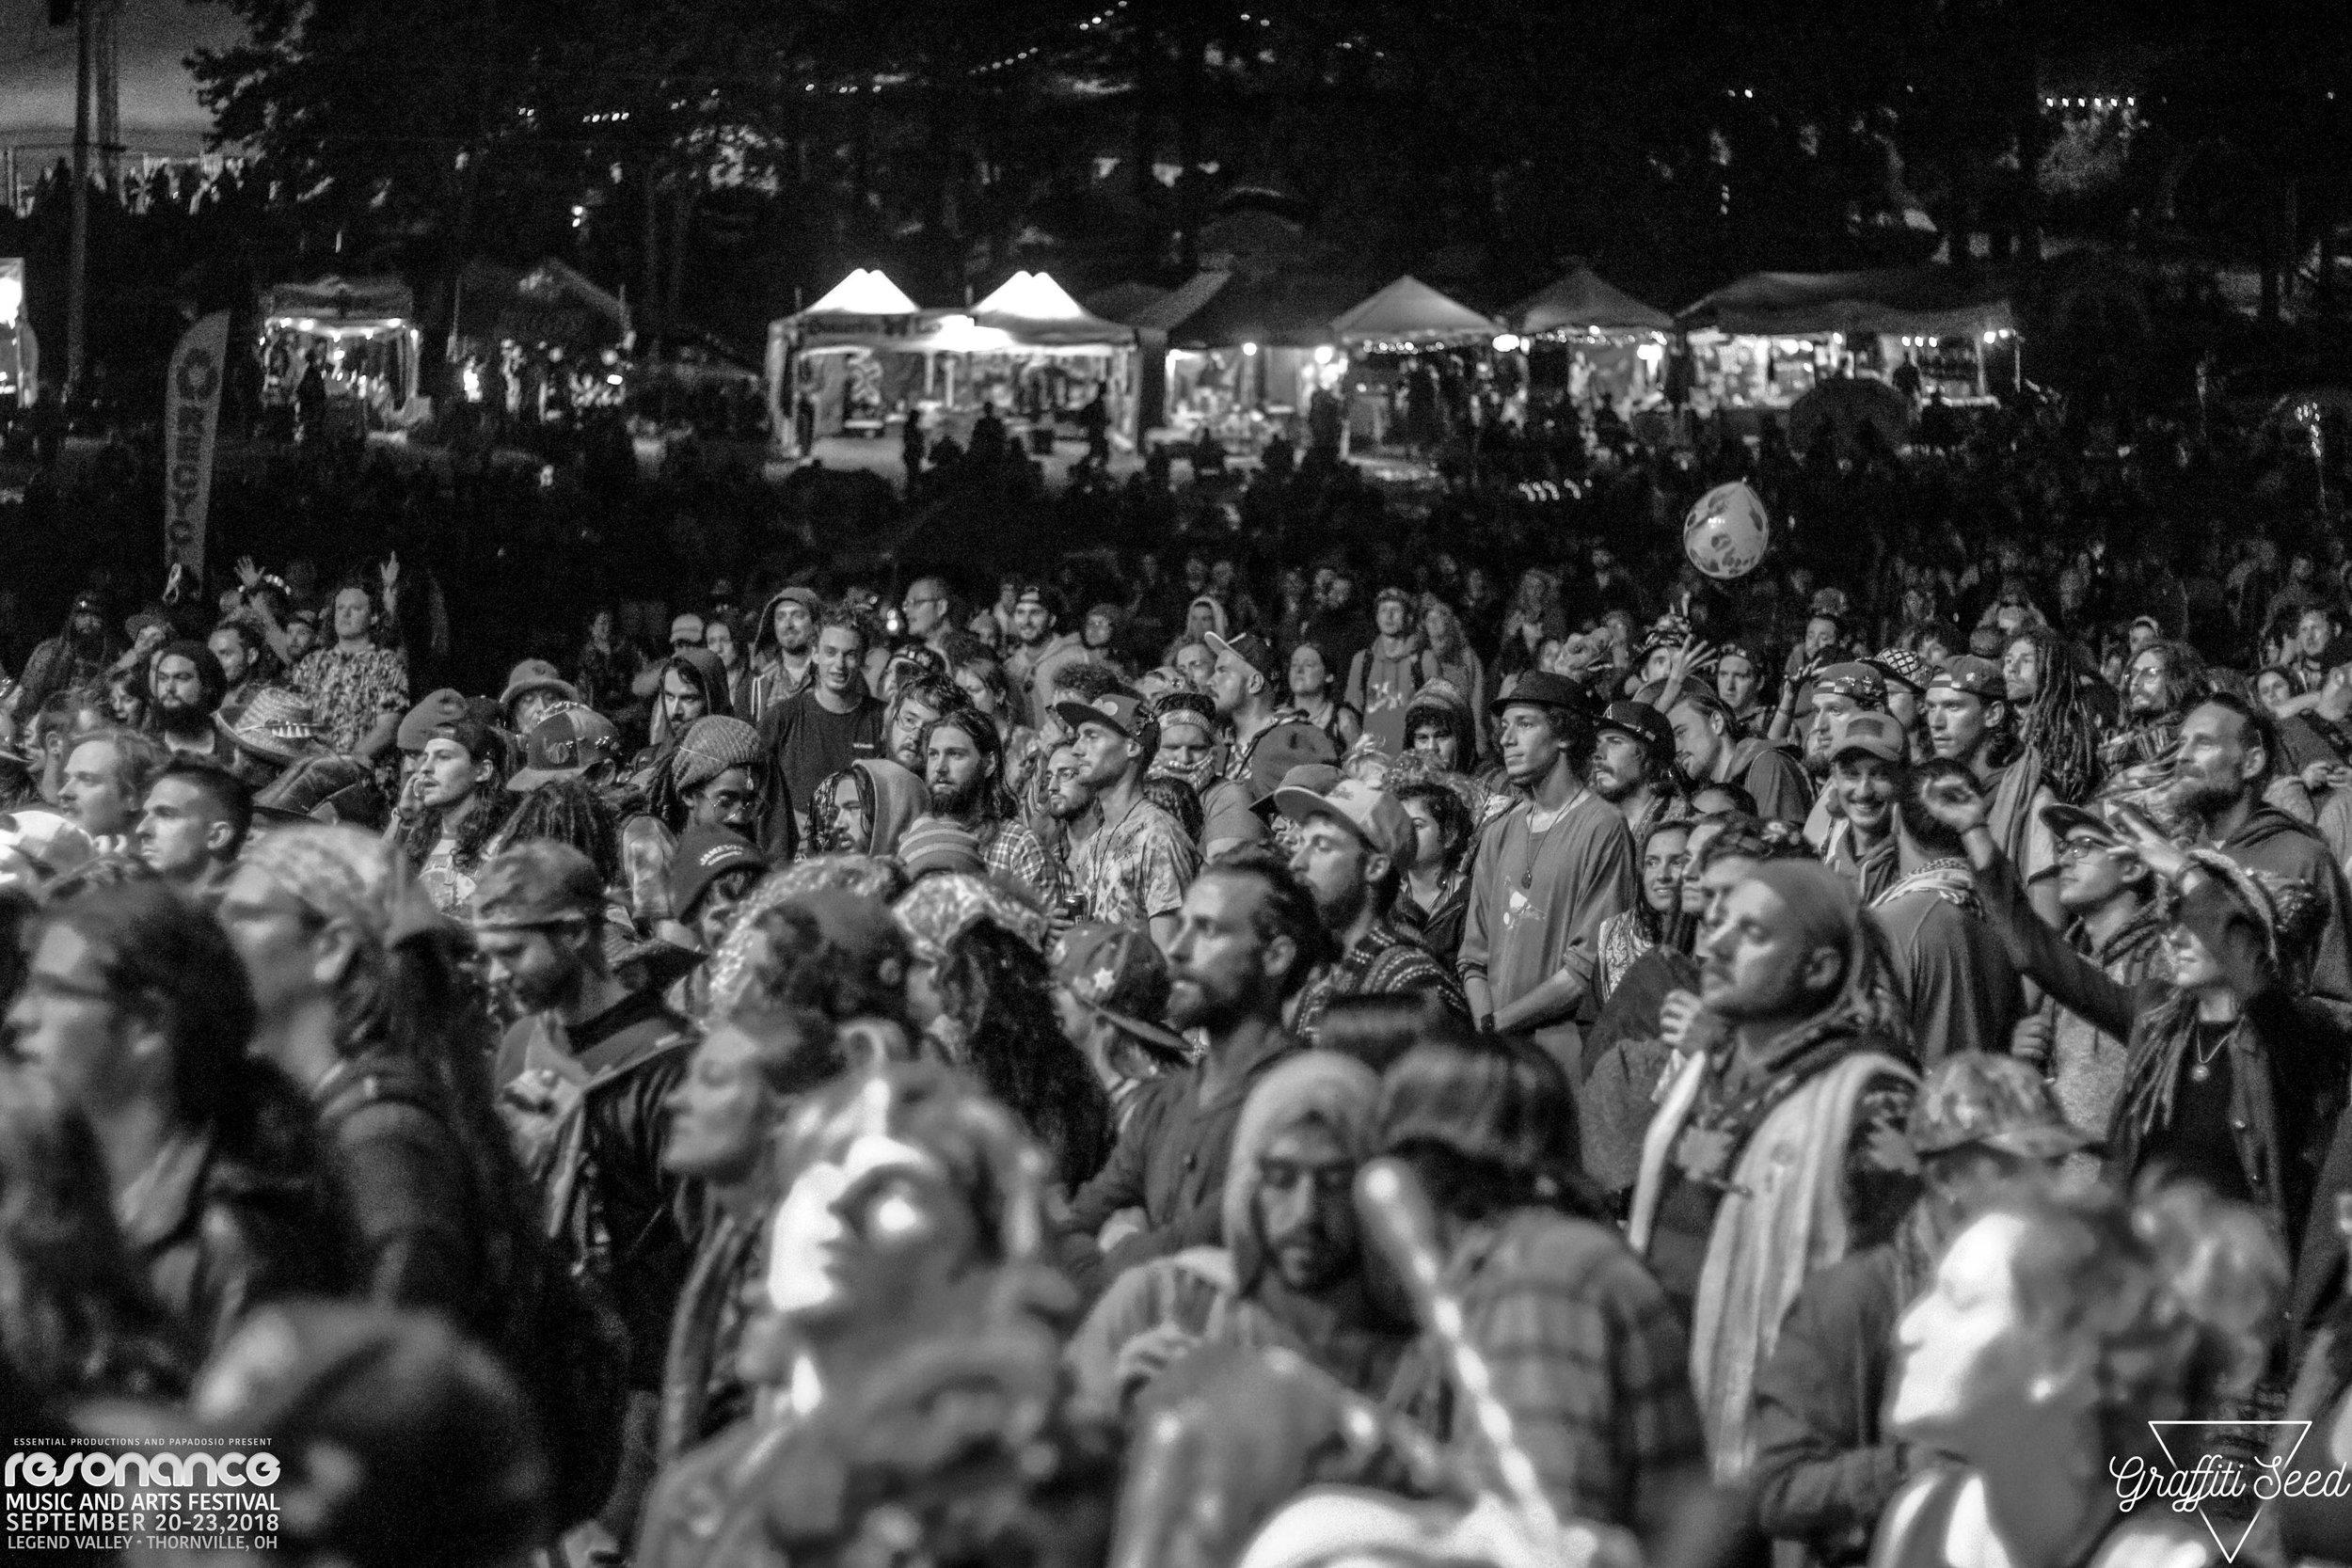 WOOKIEFOOT _ Resonance Music Festival 2018 _ www.GraffitiSeed.com 12.jpg